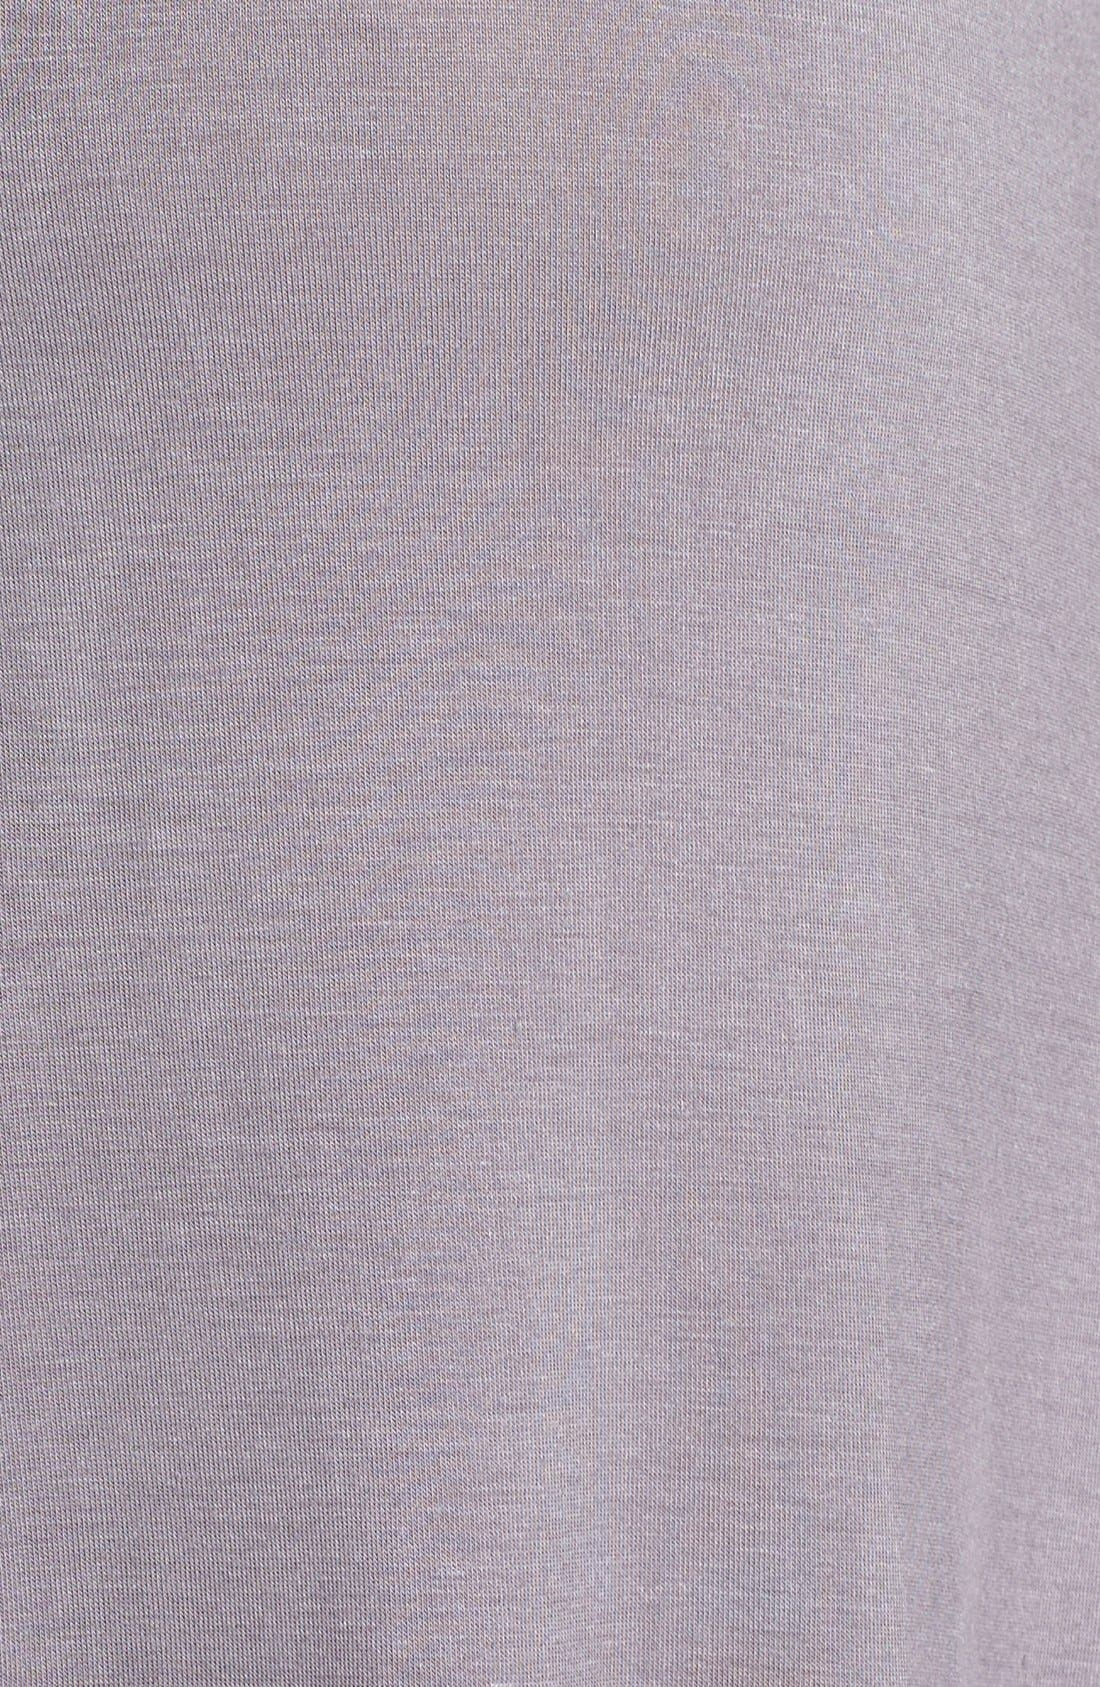 Alternate Image 5  - Belabumbum Ruffle Nursing Dress